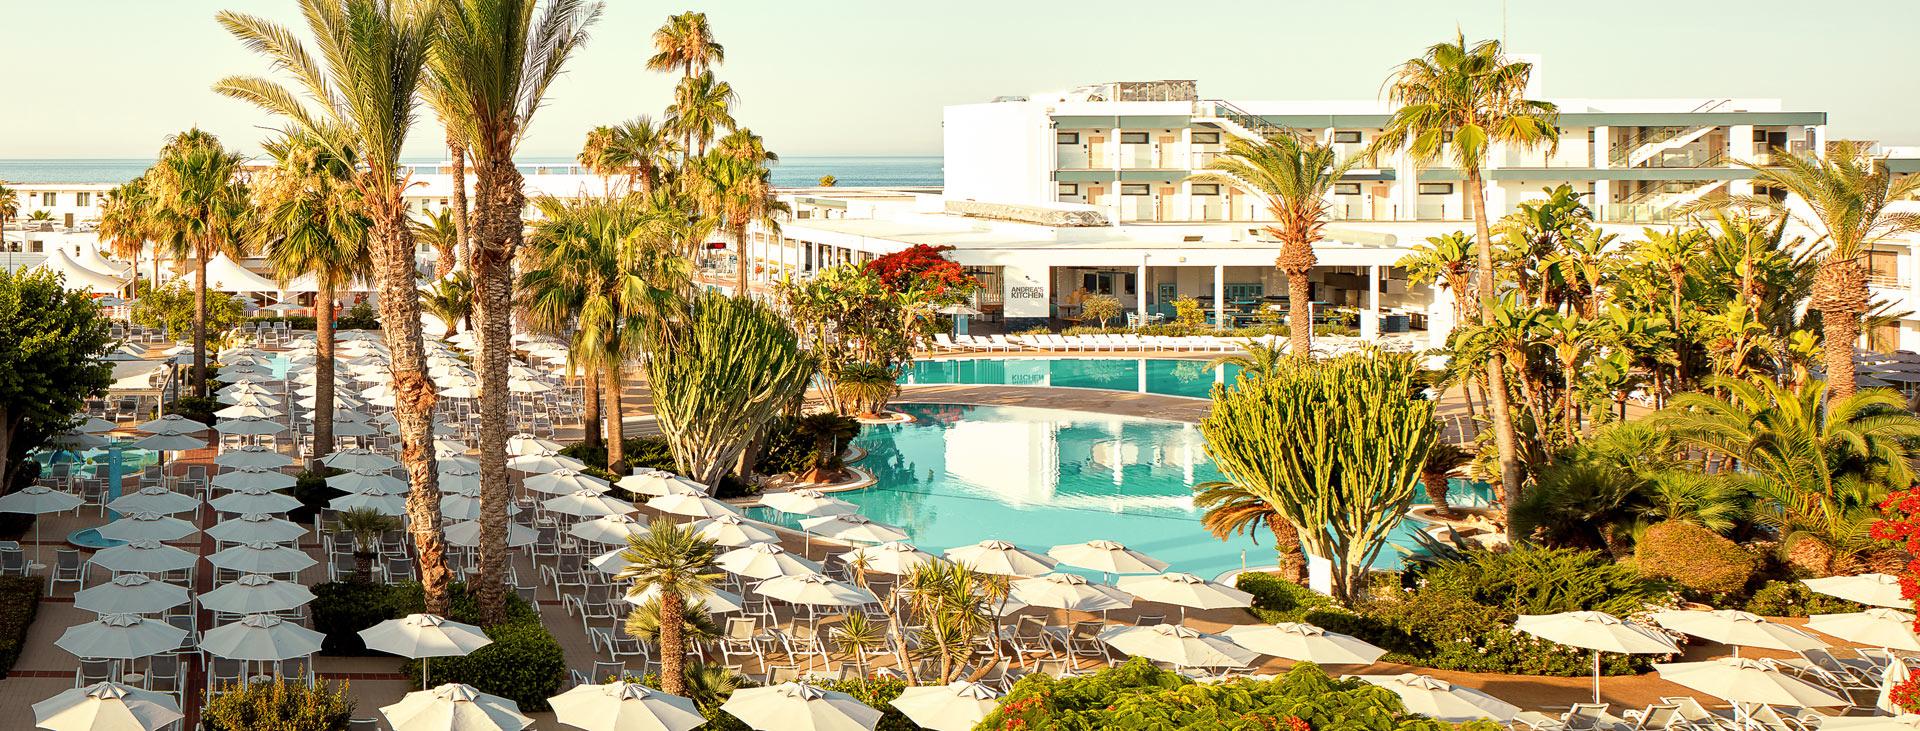 Sunwing Sandy Bay Beach, Ayia Napa, Cypern